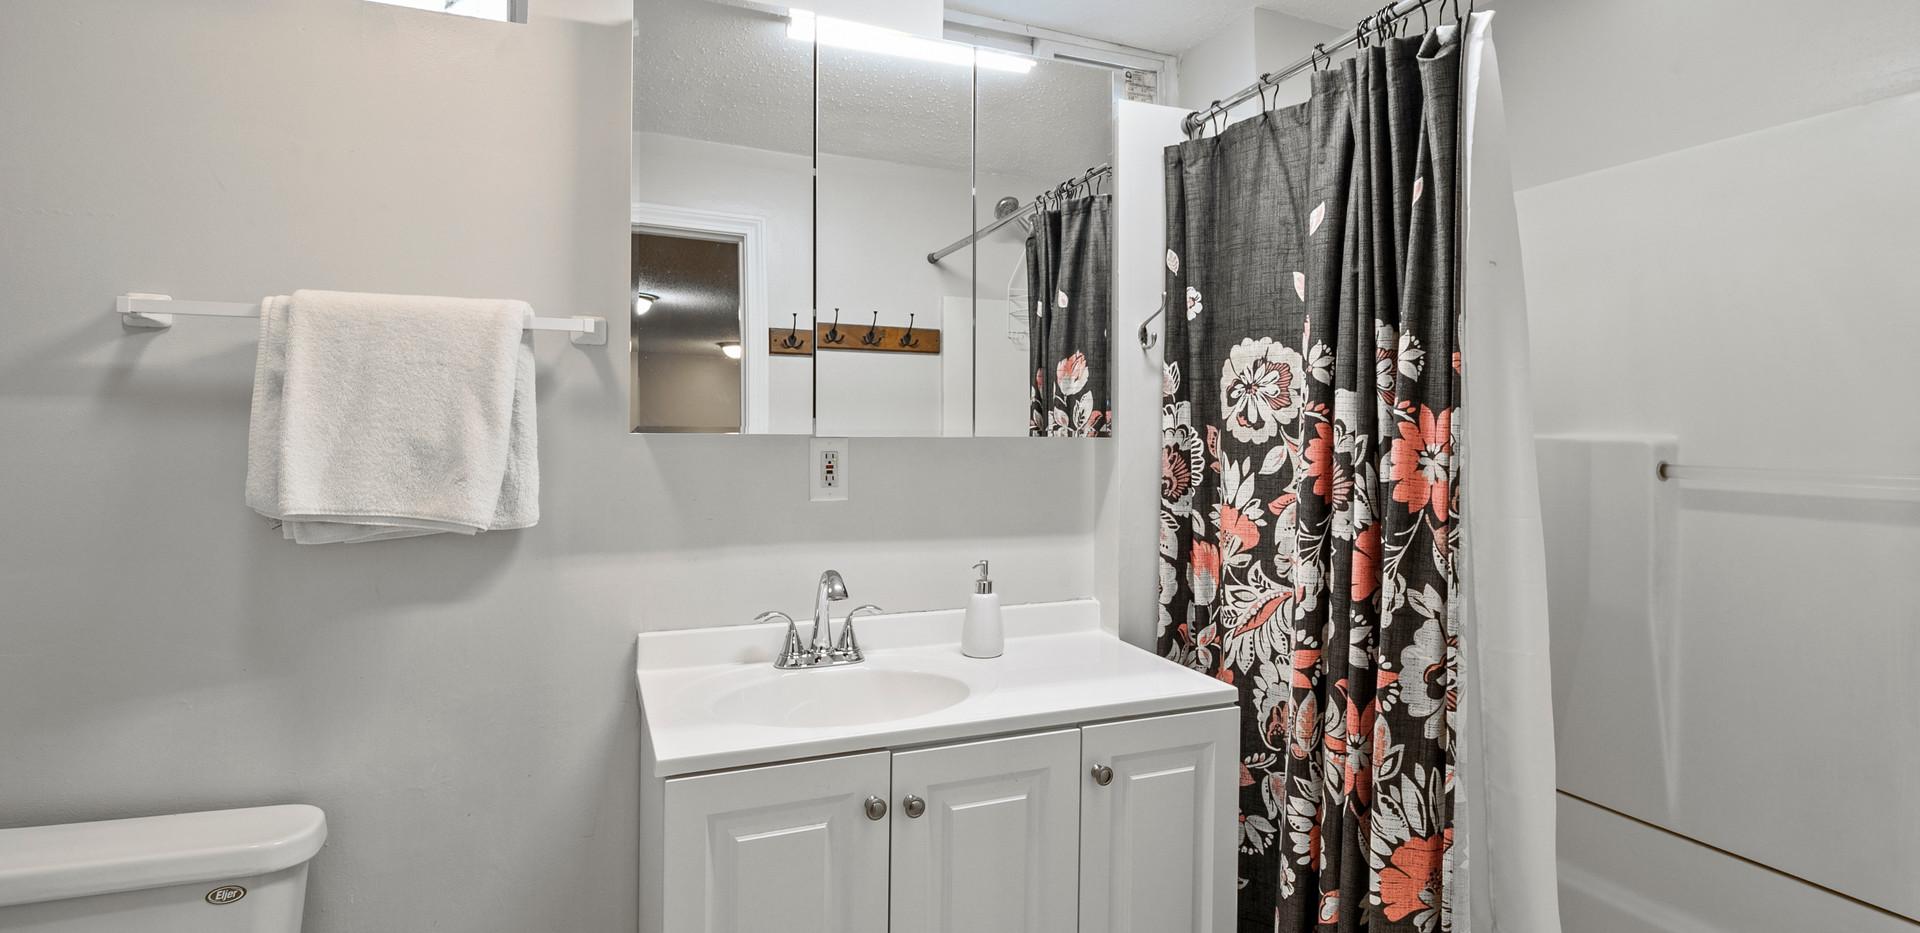 32_Shelby_B_Bathroom.jpg